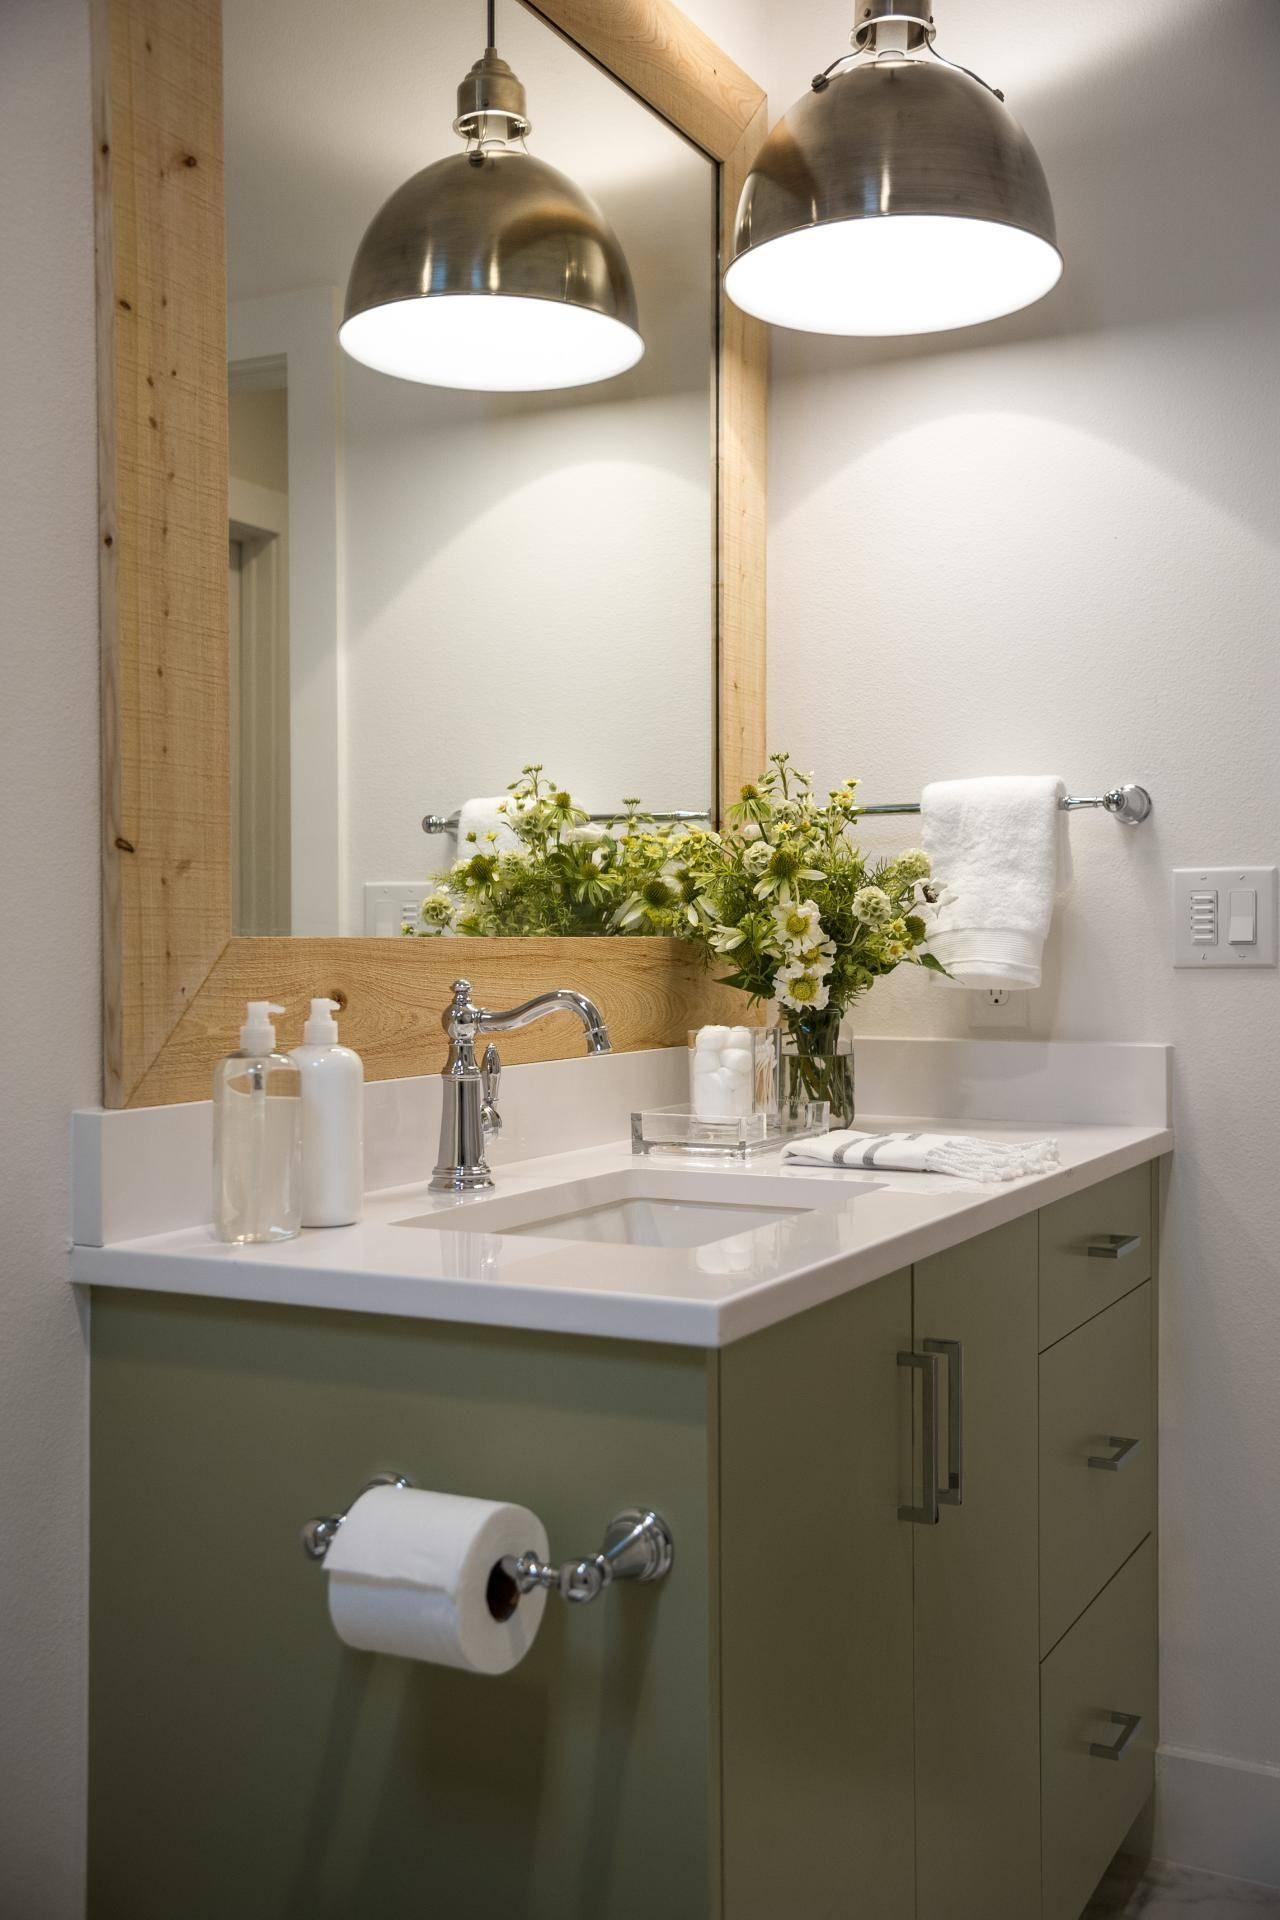 Featured Photo of Mini Pendant Lights For Bathroom